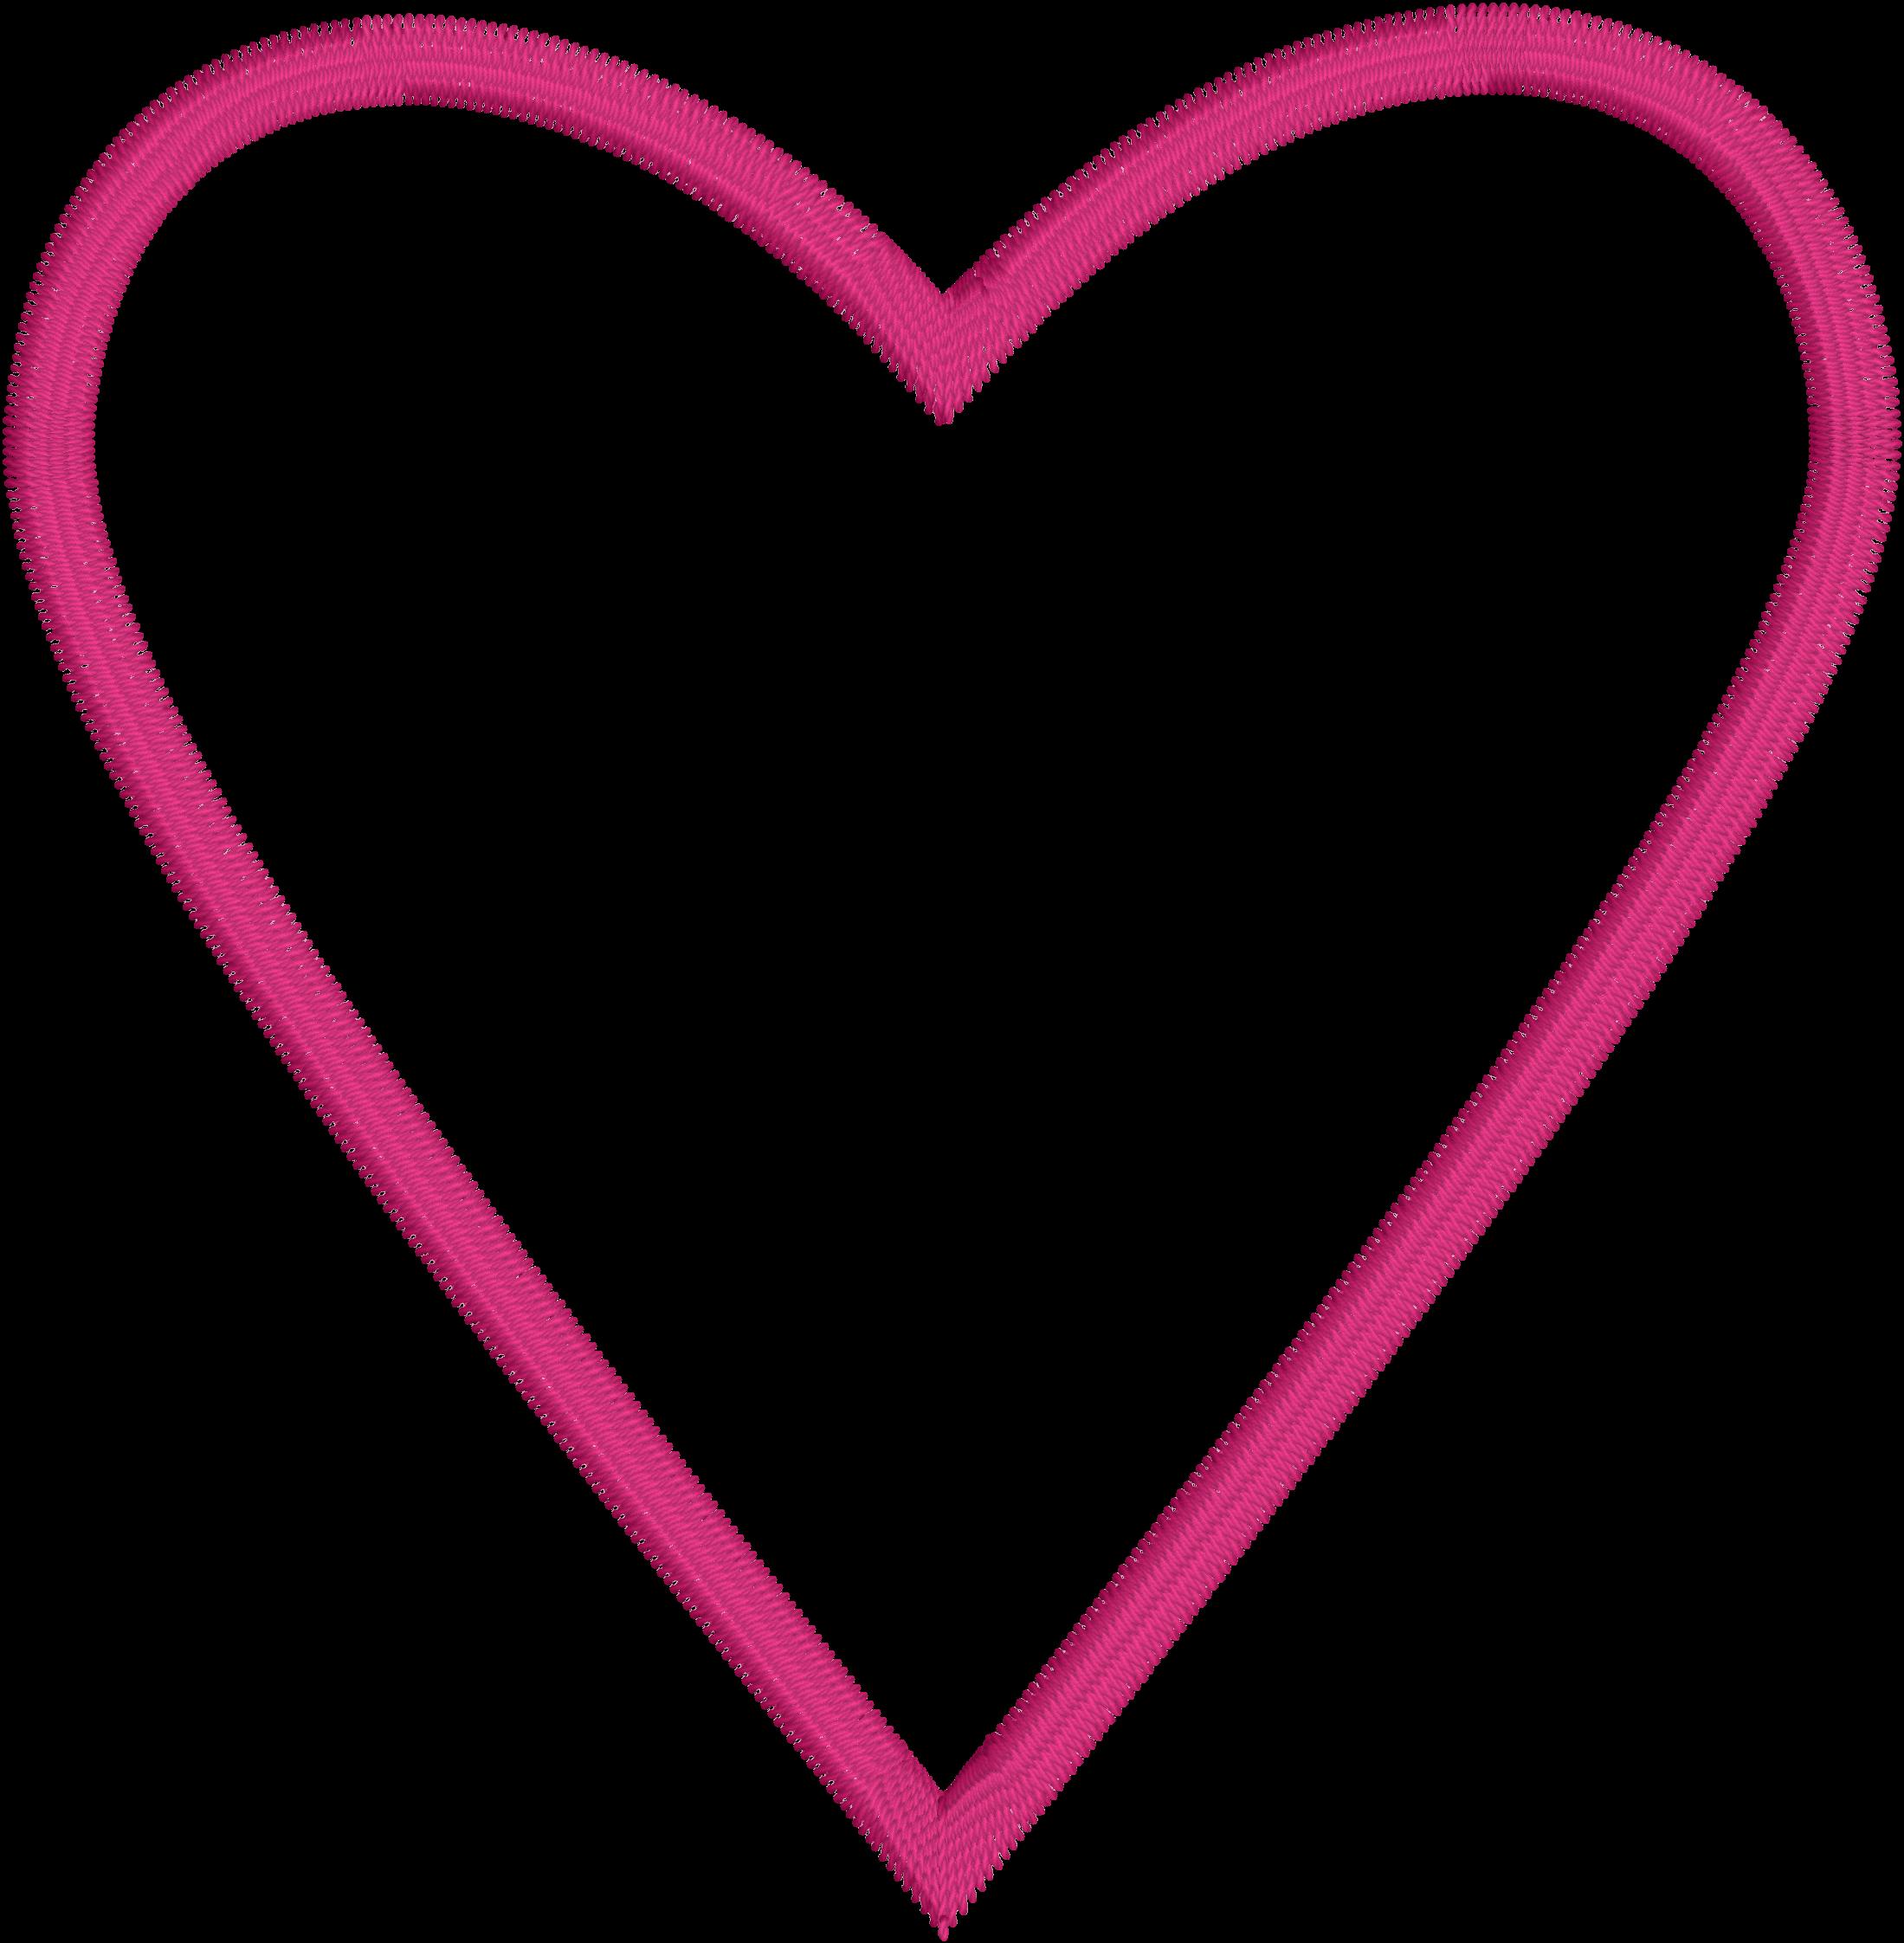 Hearts clipart doily.  ith applique heart